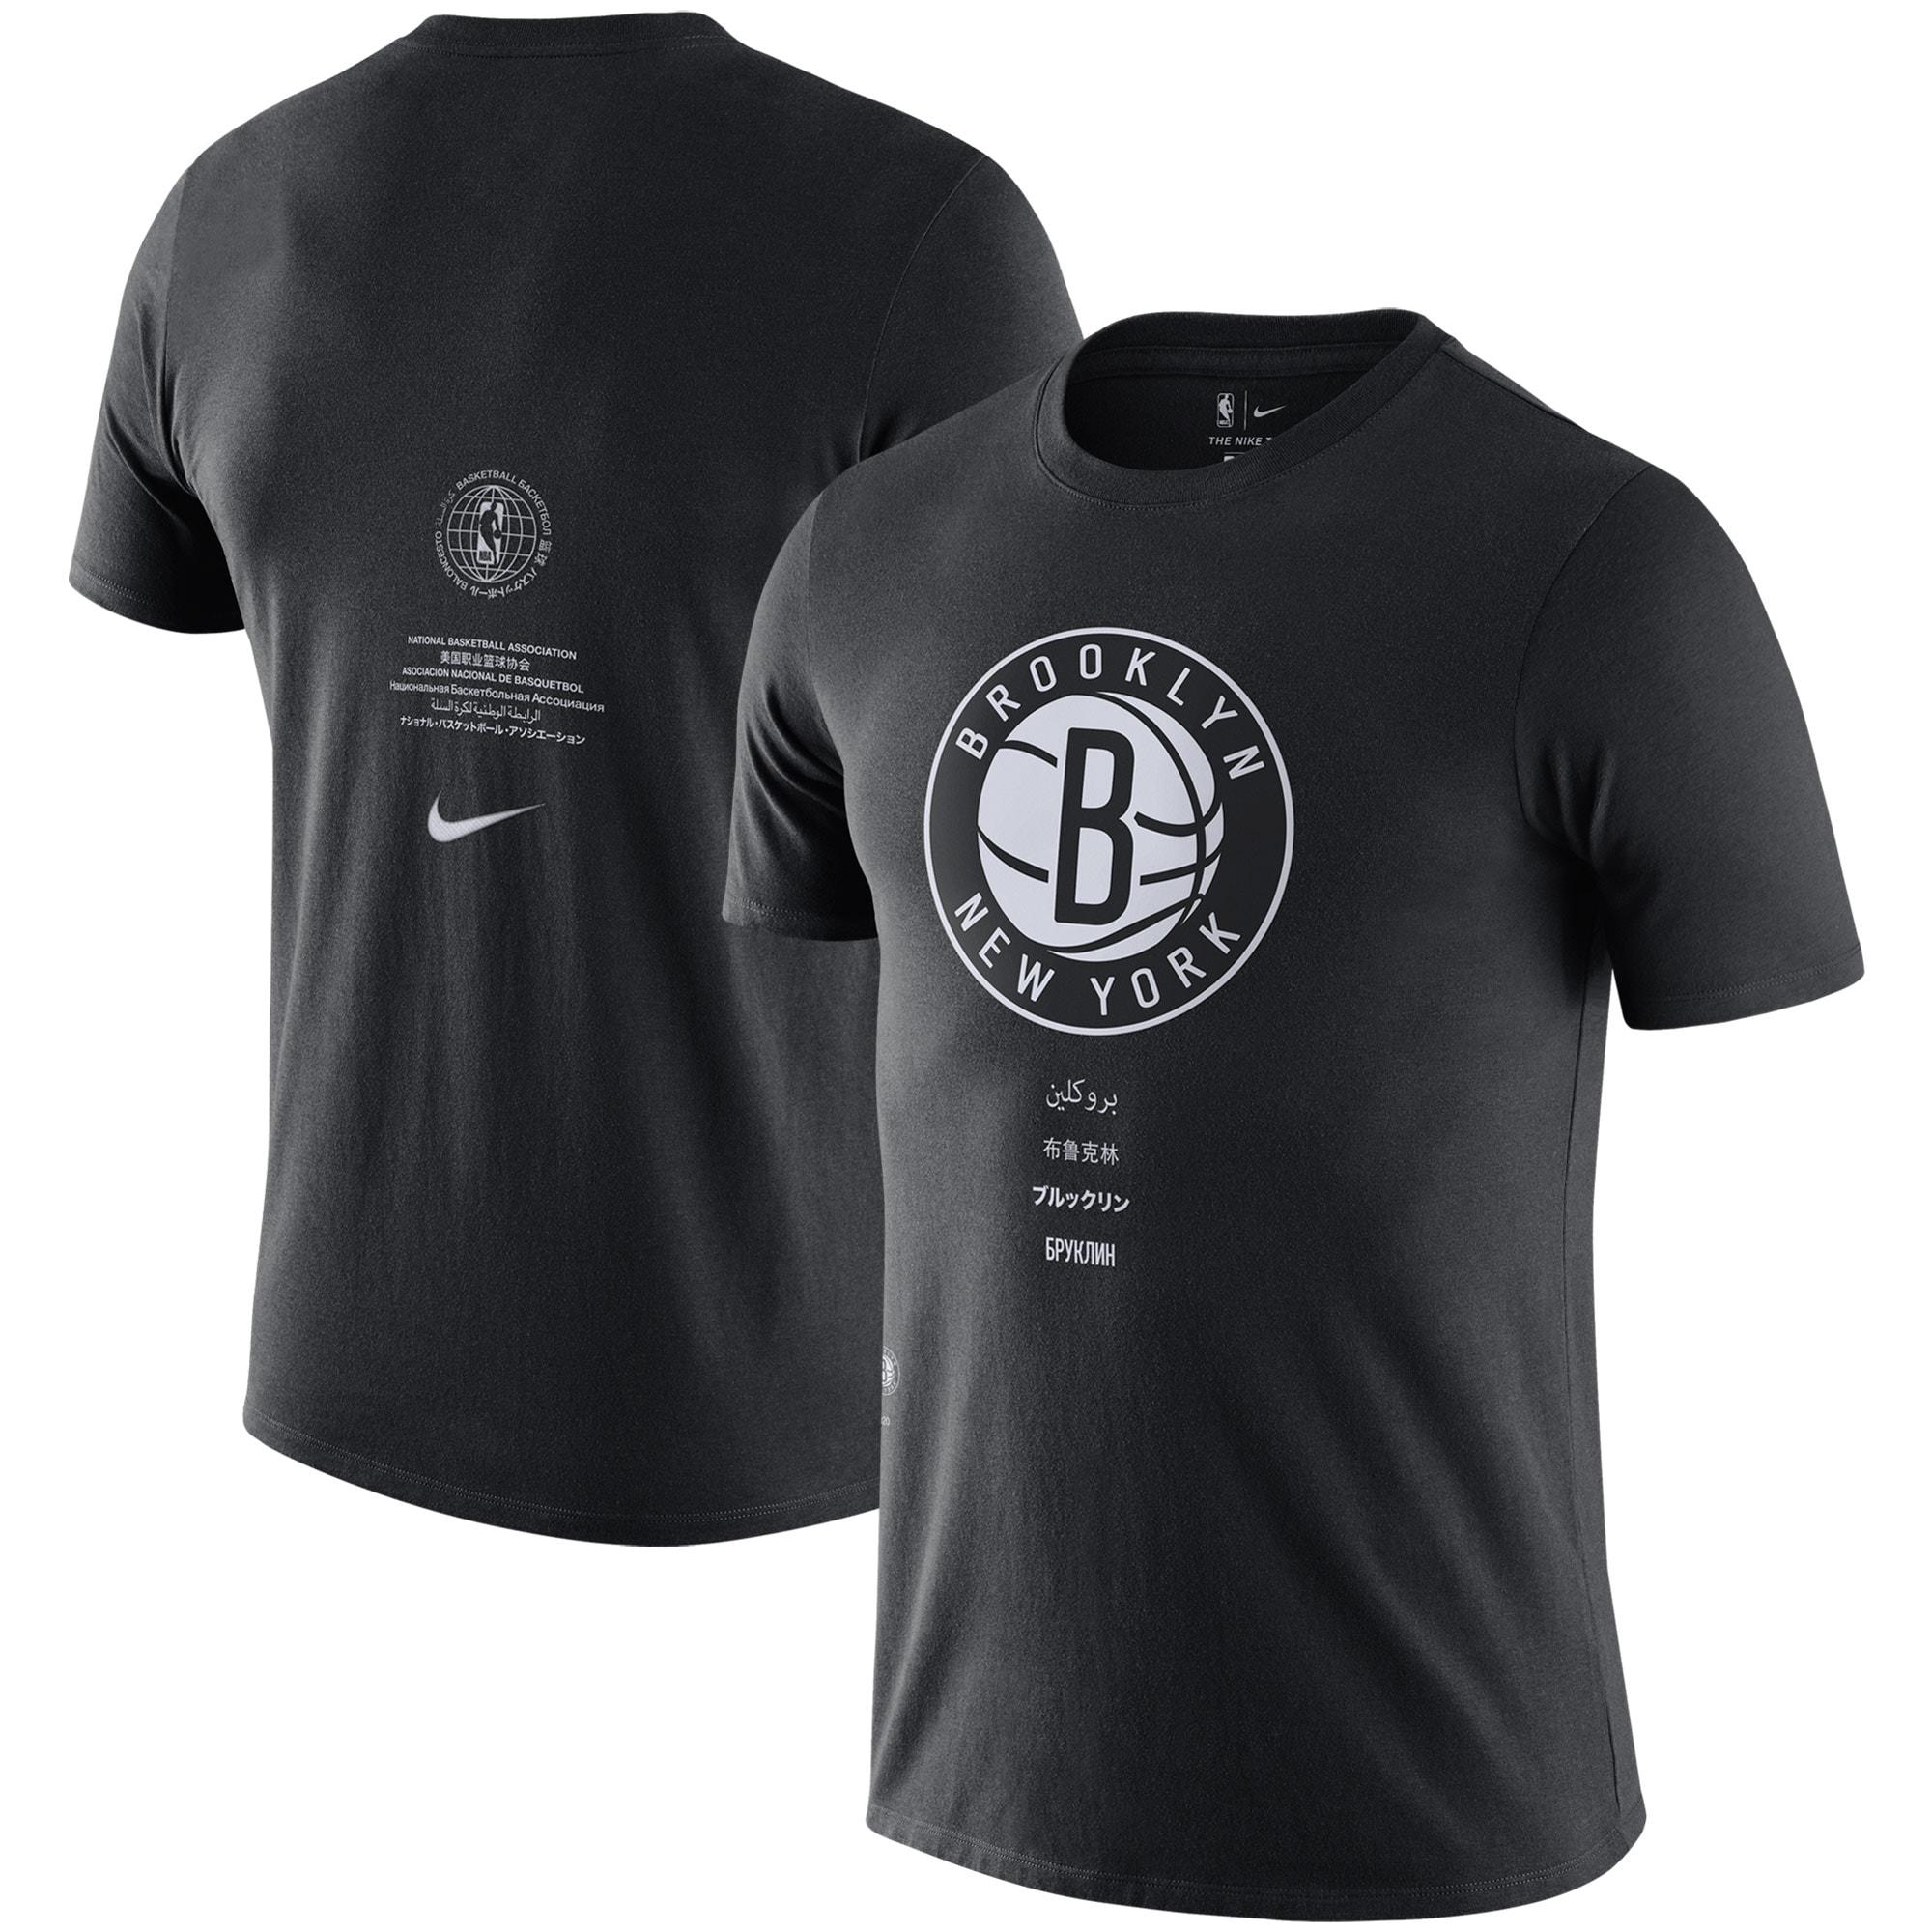 Brooklyn Nets Nike Courtside Global Exploration T-Shirt - Black